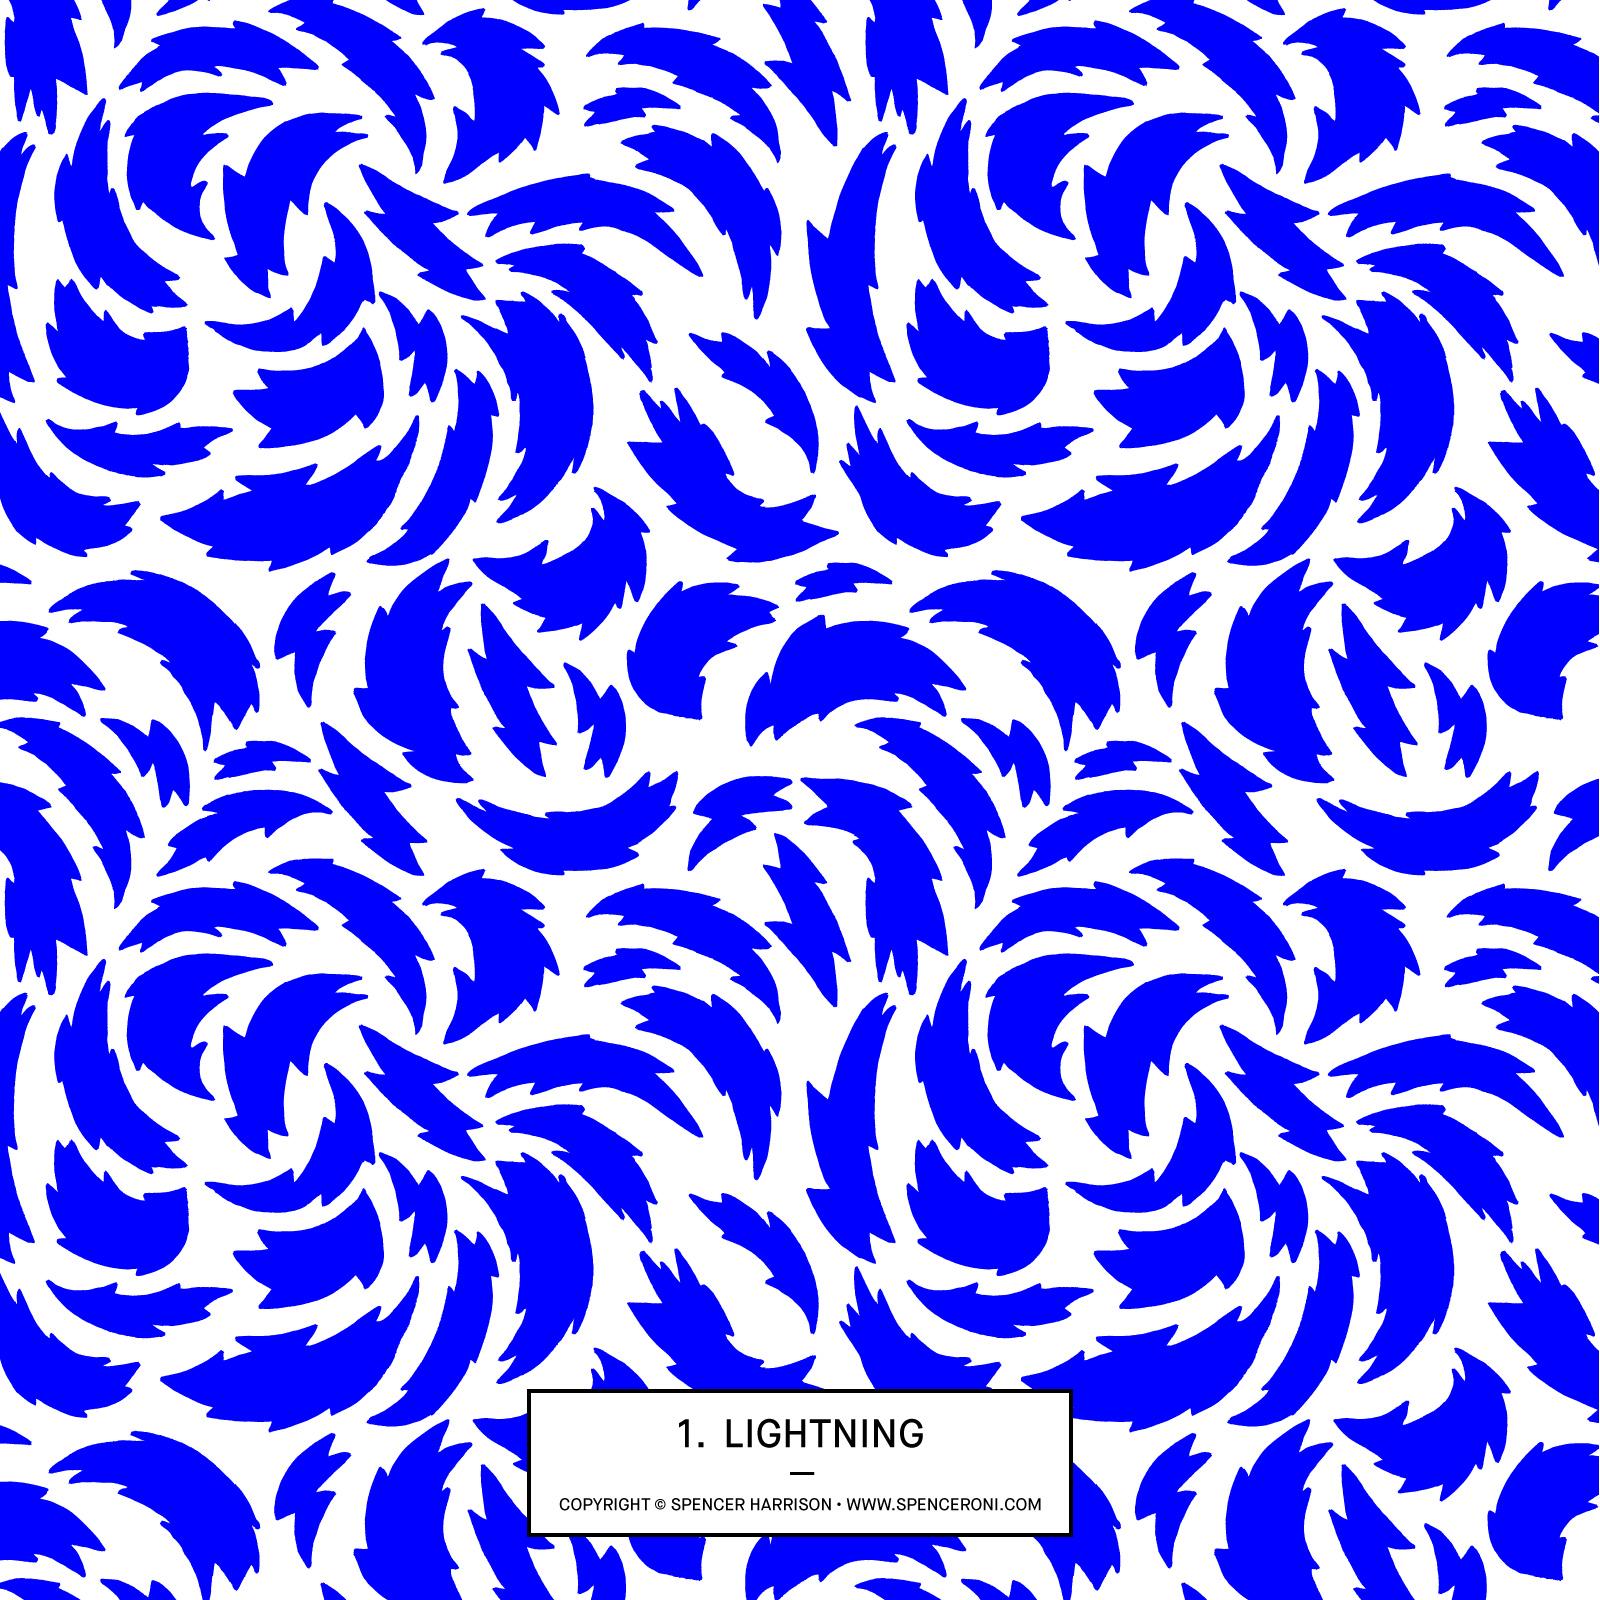 Spenceroni-Pattern-01.jpg